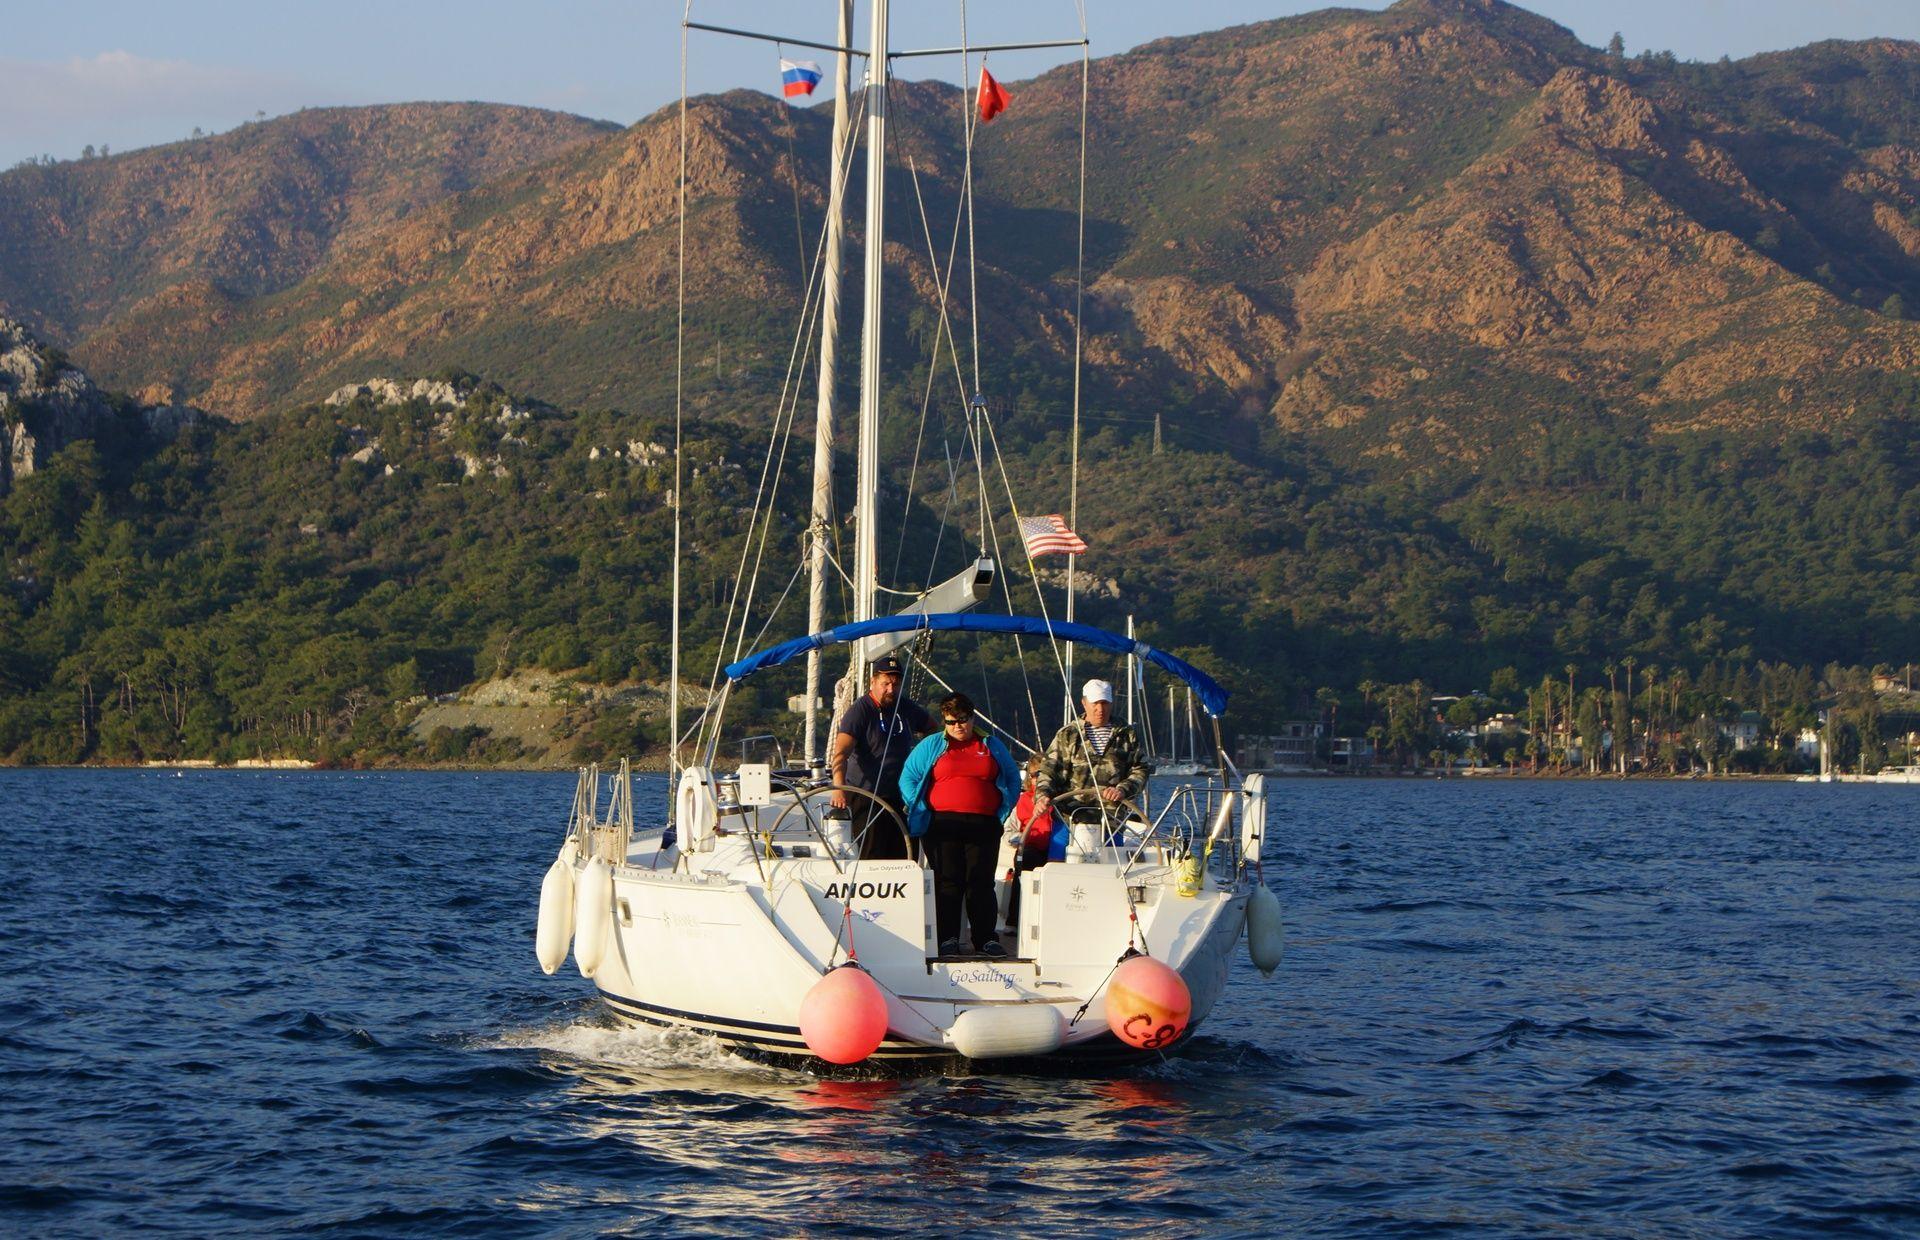 https://media.insailing.com/boat/anouk/image_1589534357031.jpg